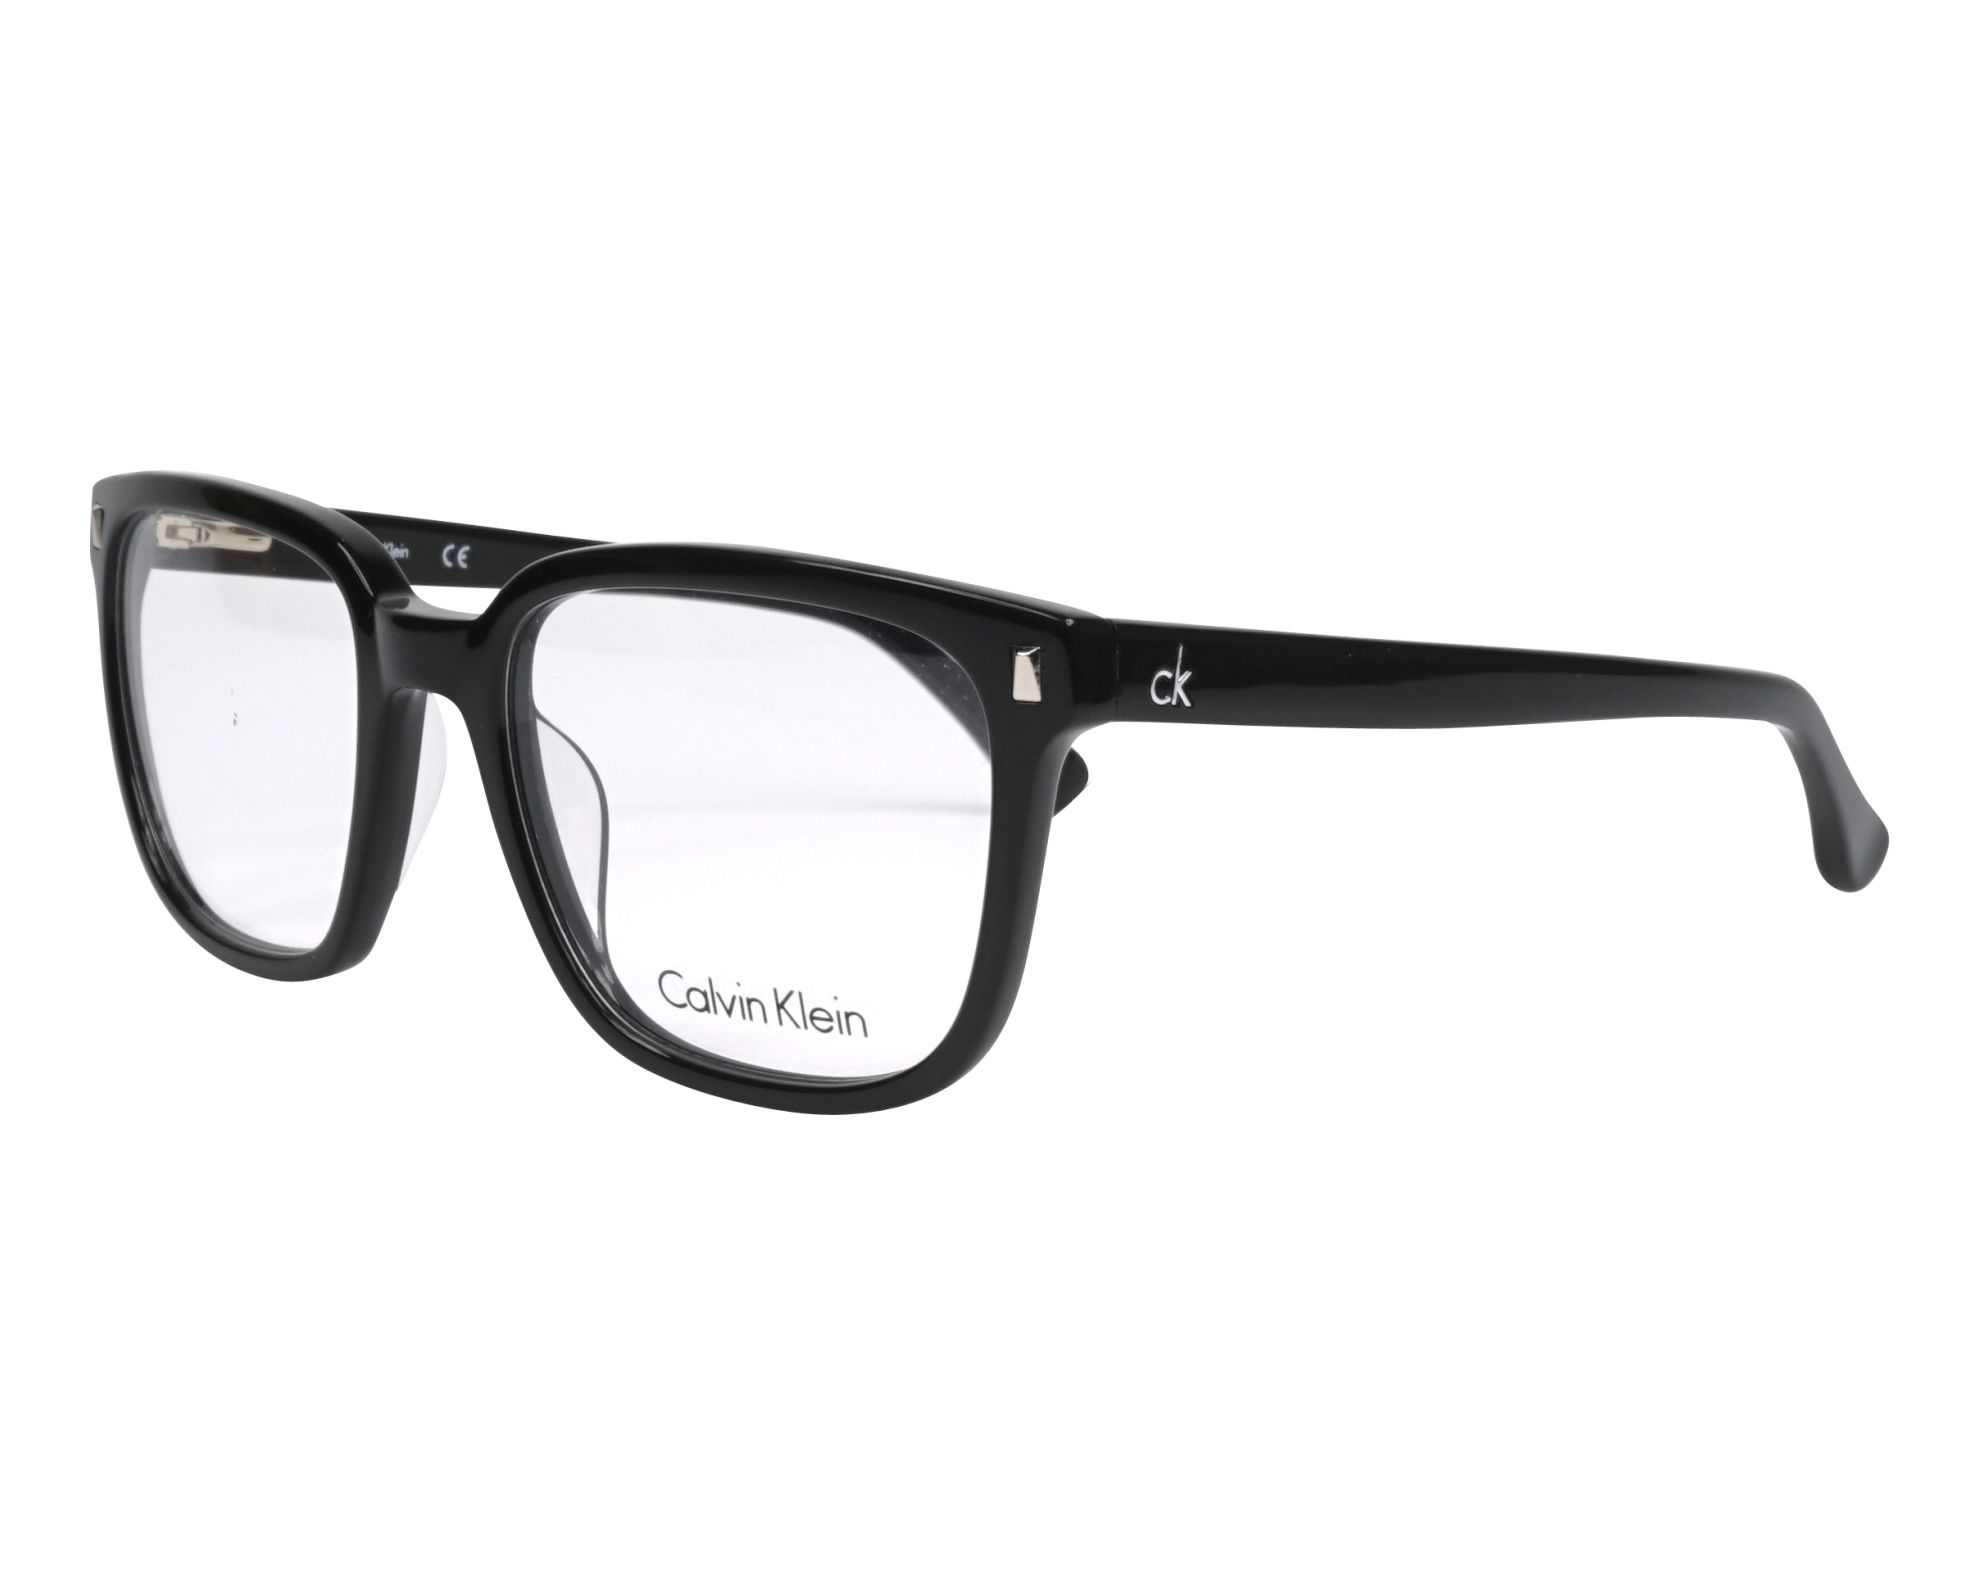 f64dd0670c Gafas Graduadas Calvin Klein CK-5862 001 52-19 Negra vista de perfil